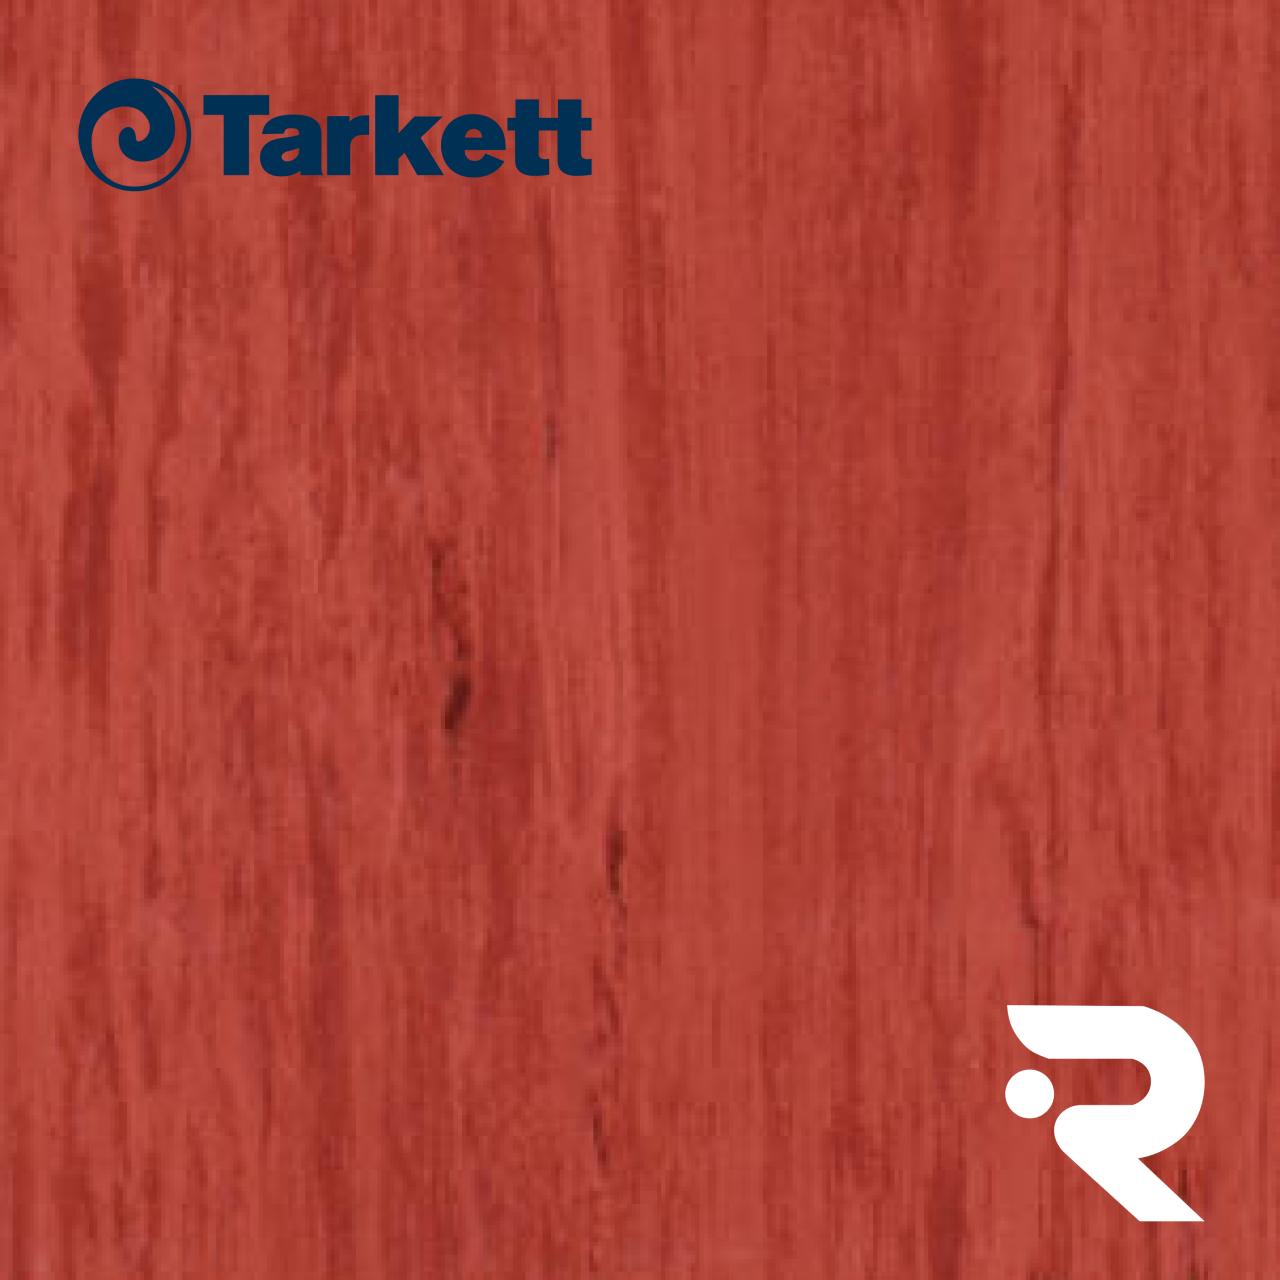 🏫 Гомогенный линолеум Tarkett | Standard RED 0488 | Standard Plus 2.0 mm | 2 х 23 м